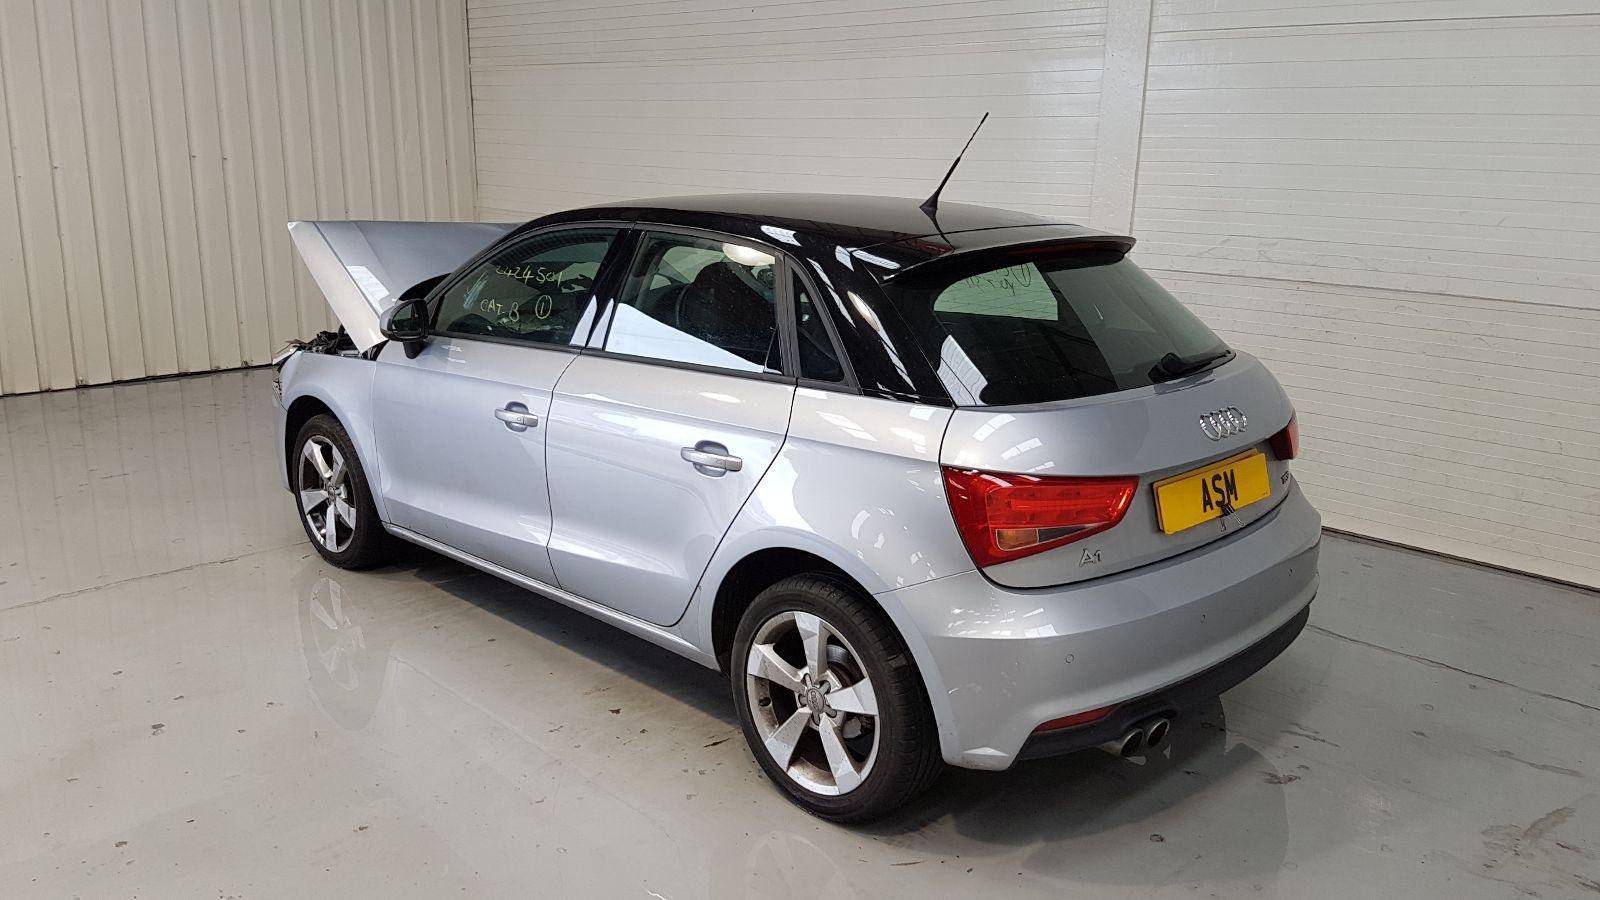 View Auto part LR Window Regulator Audi A1 2016